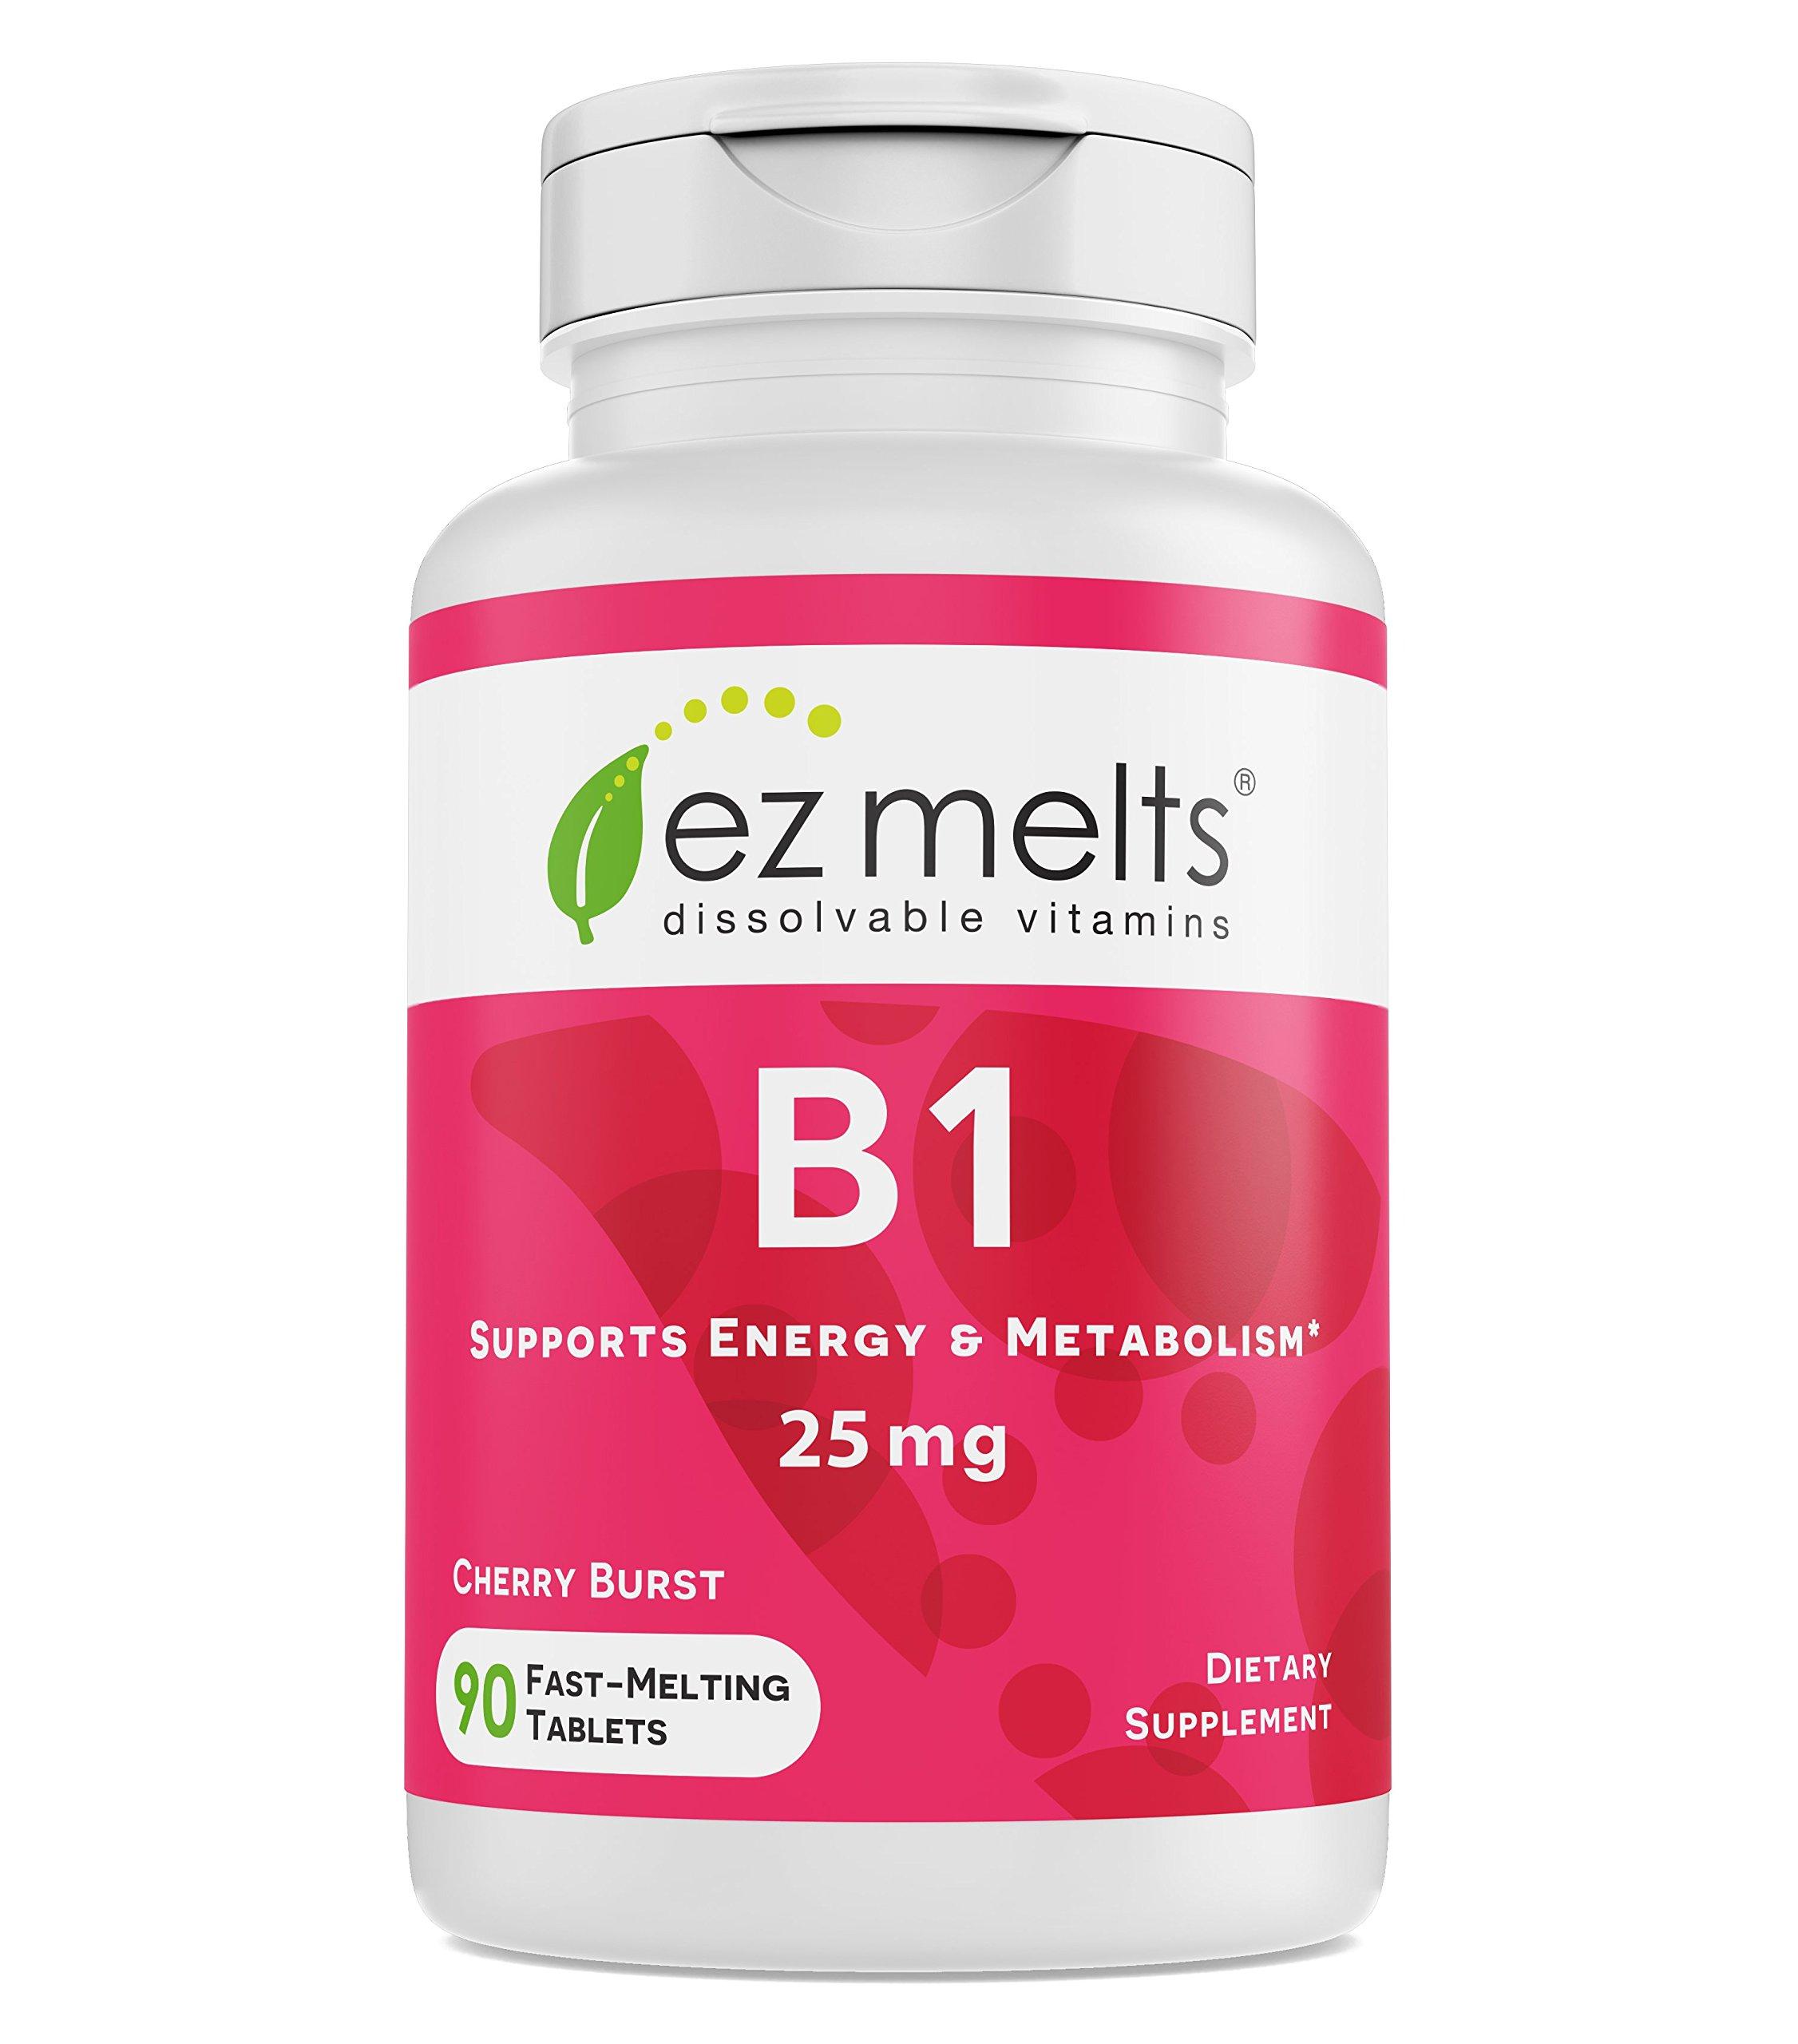 EZ Melts B1 as Thiamine, 25 mg, Sublingual Vitamins, Vegan, Zero Sugar, Natural Cherry Flavor, 90 Fast Dissolve Tablets by EZ Melts